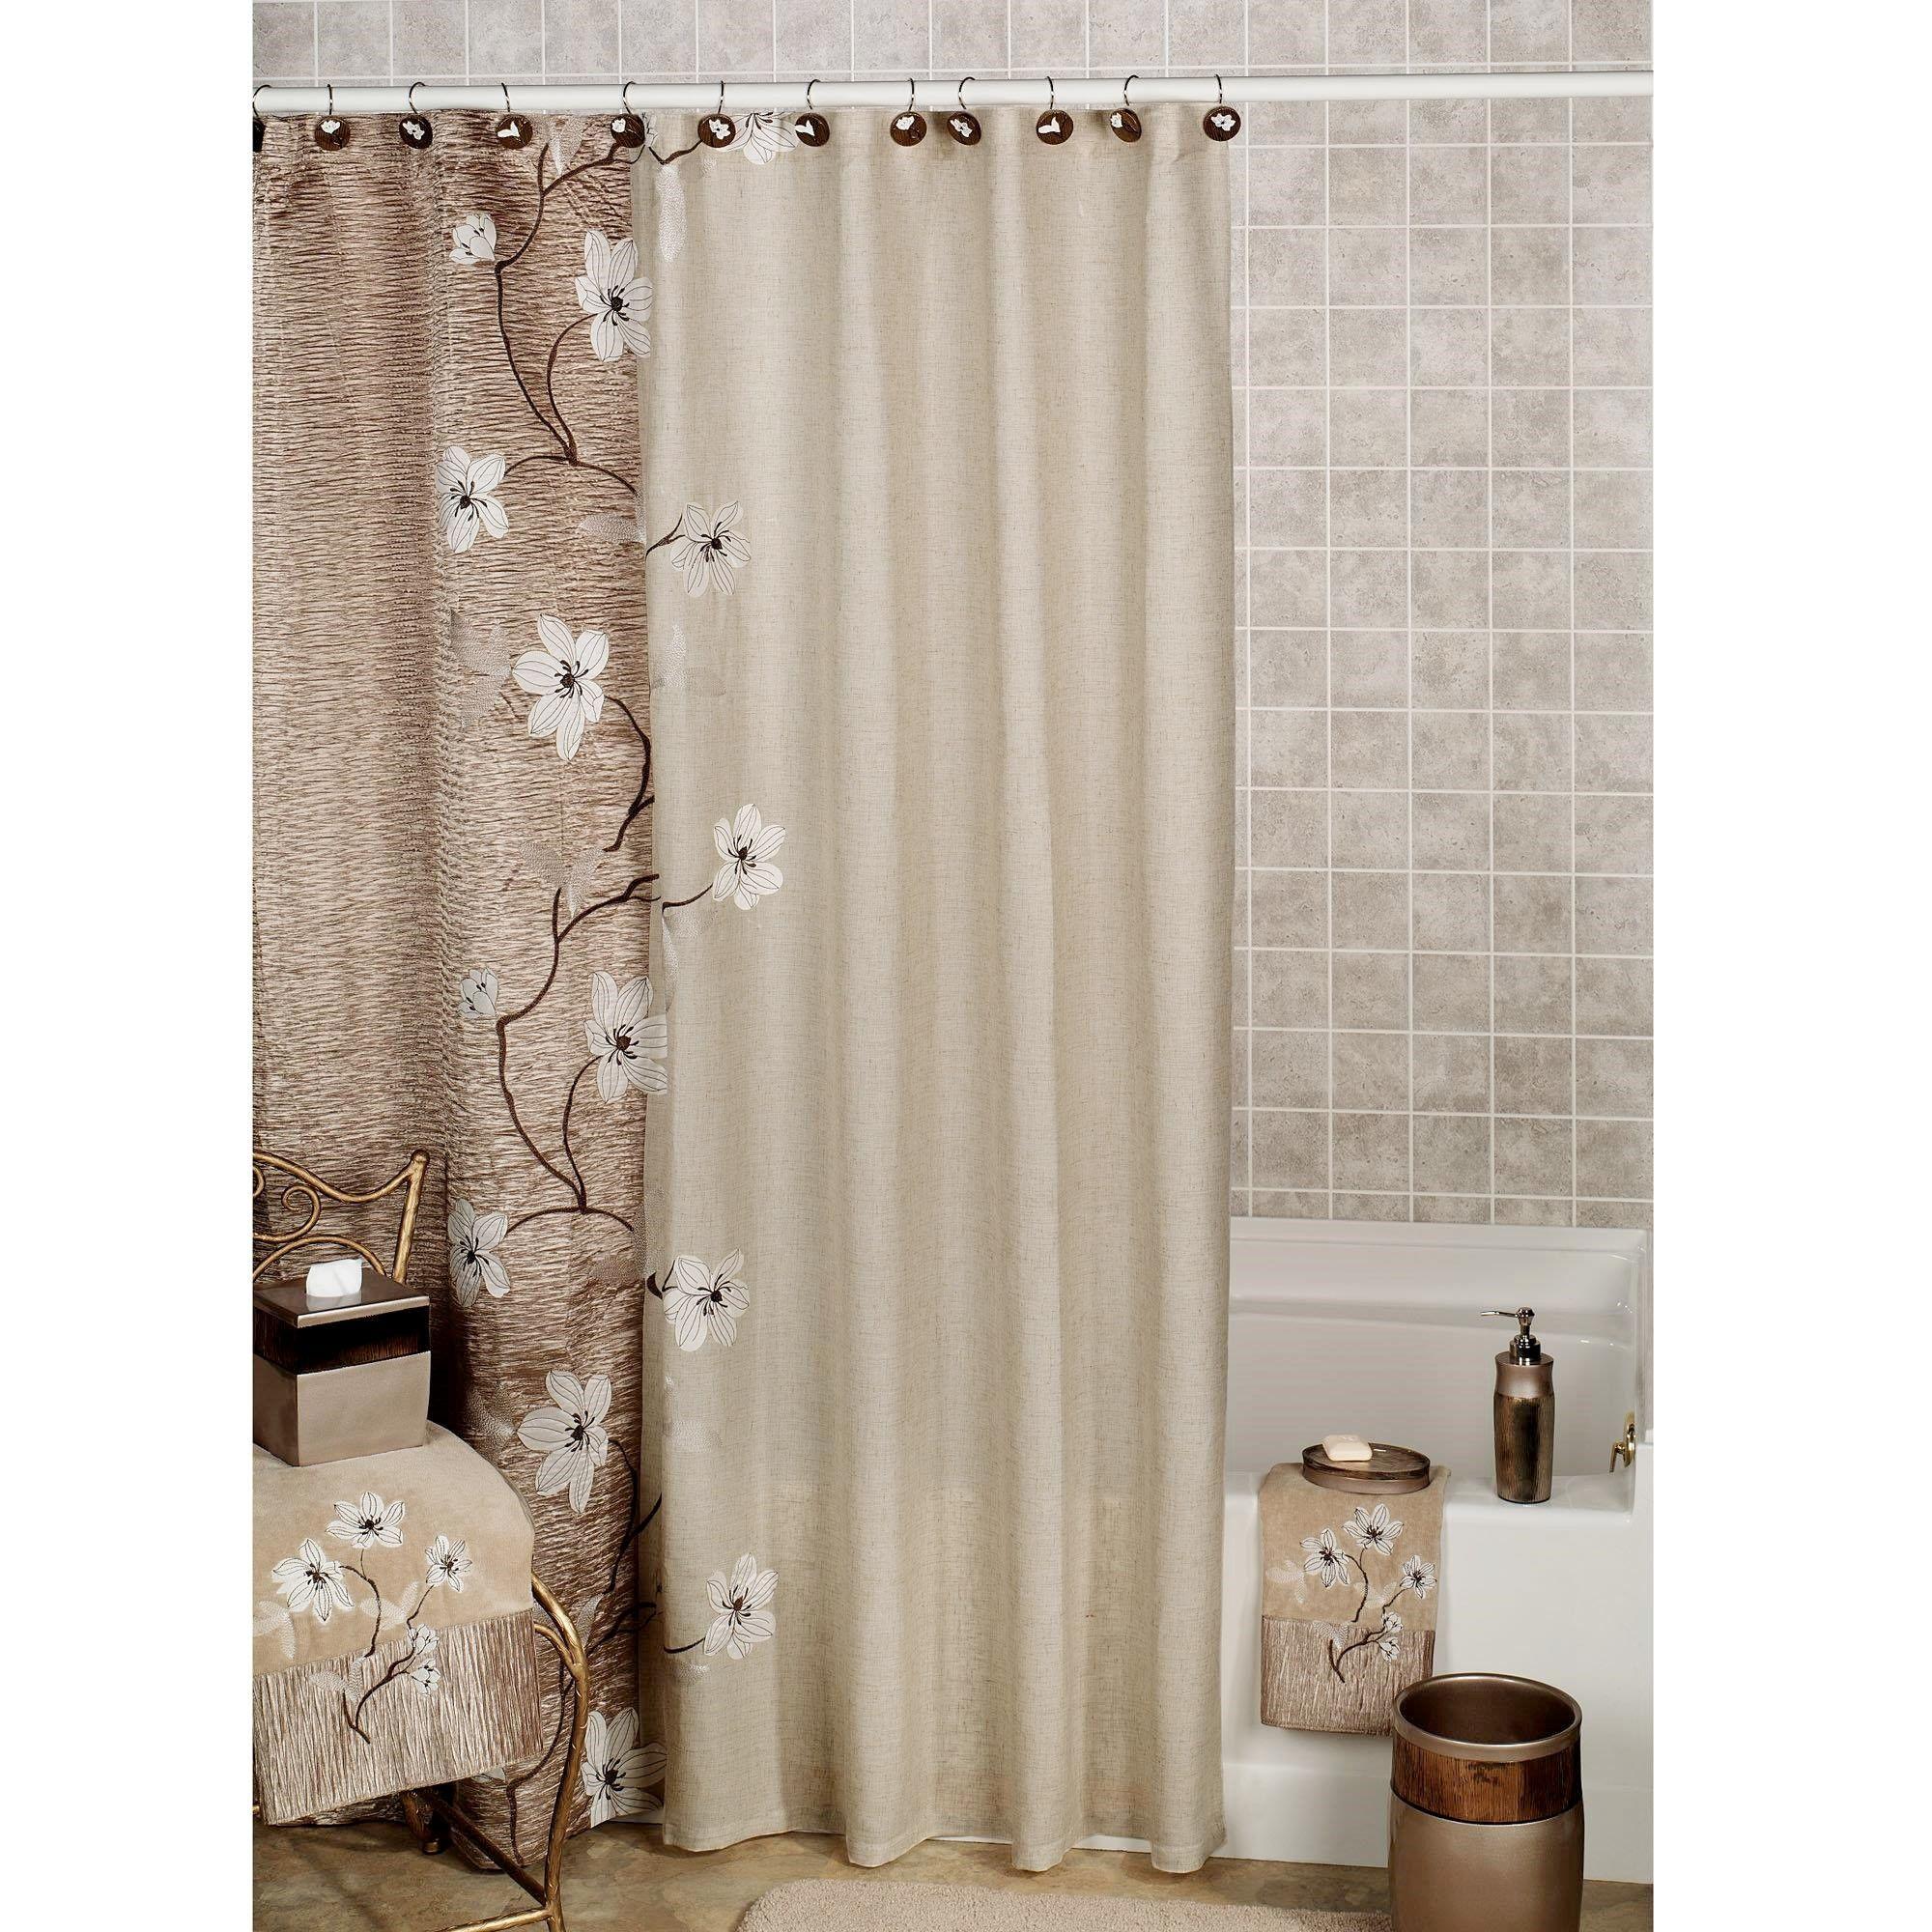 23 Elegant Bathroom Shower Curtain Ideas Photos Remodel And Interesting Elegant Bathroom Shower Curtains Design Decoration